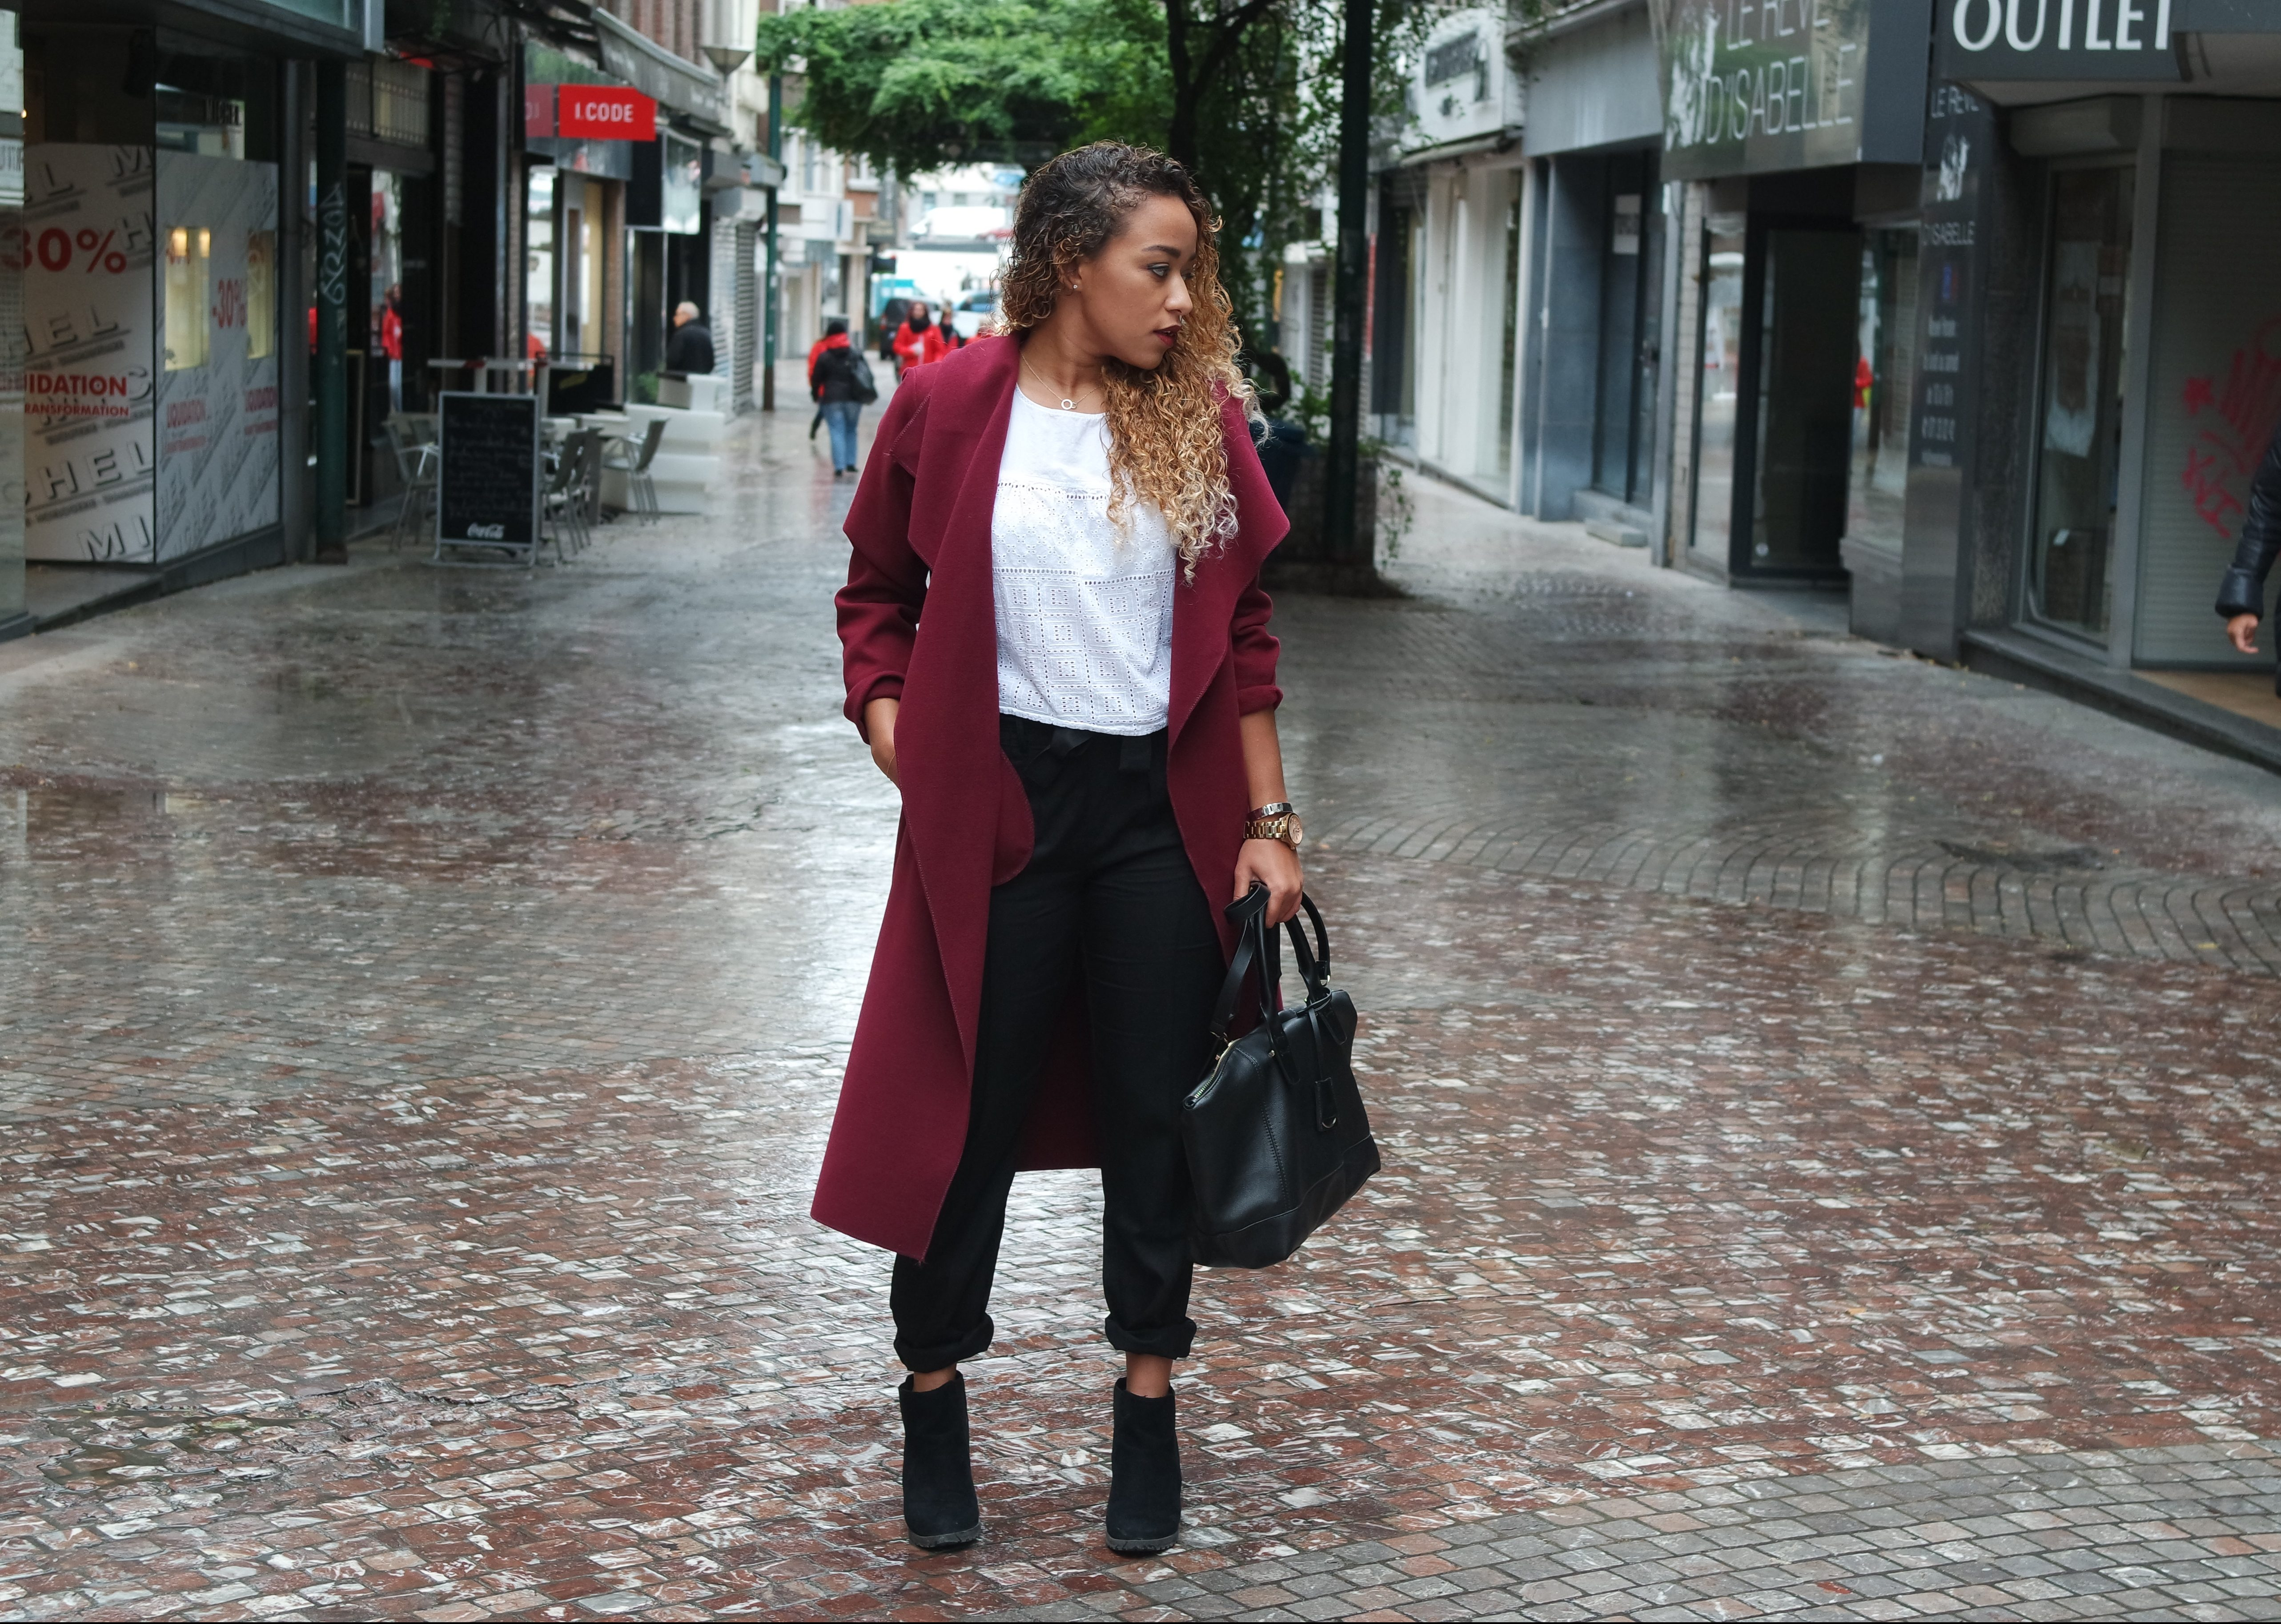 zalando-creative-content-award-belgium-canada-blog-style-mode-rue-dampremy-charleroi-profil